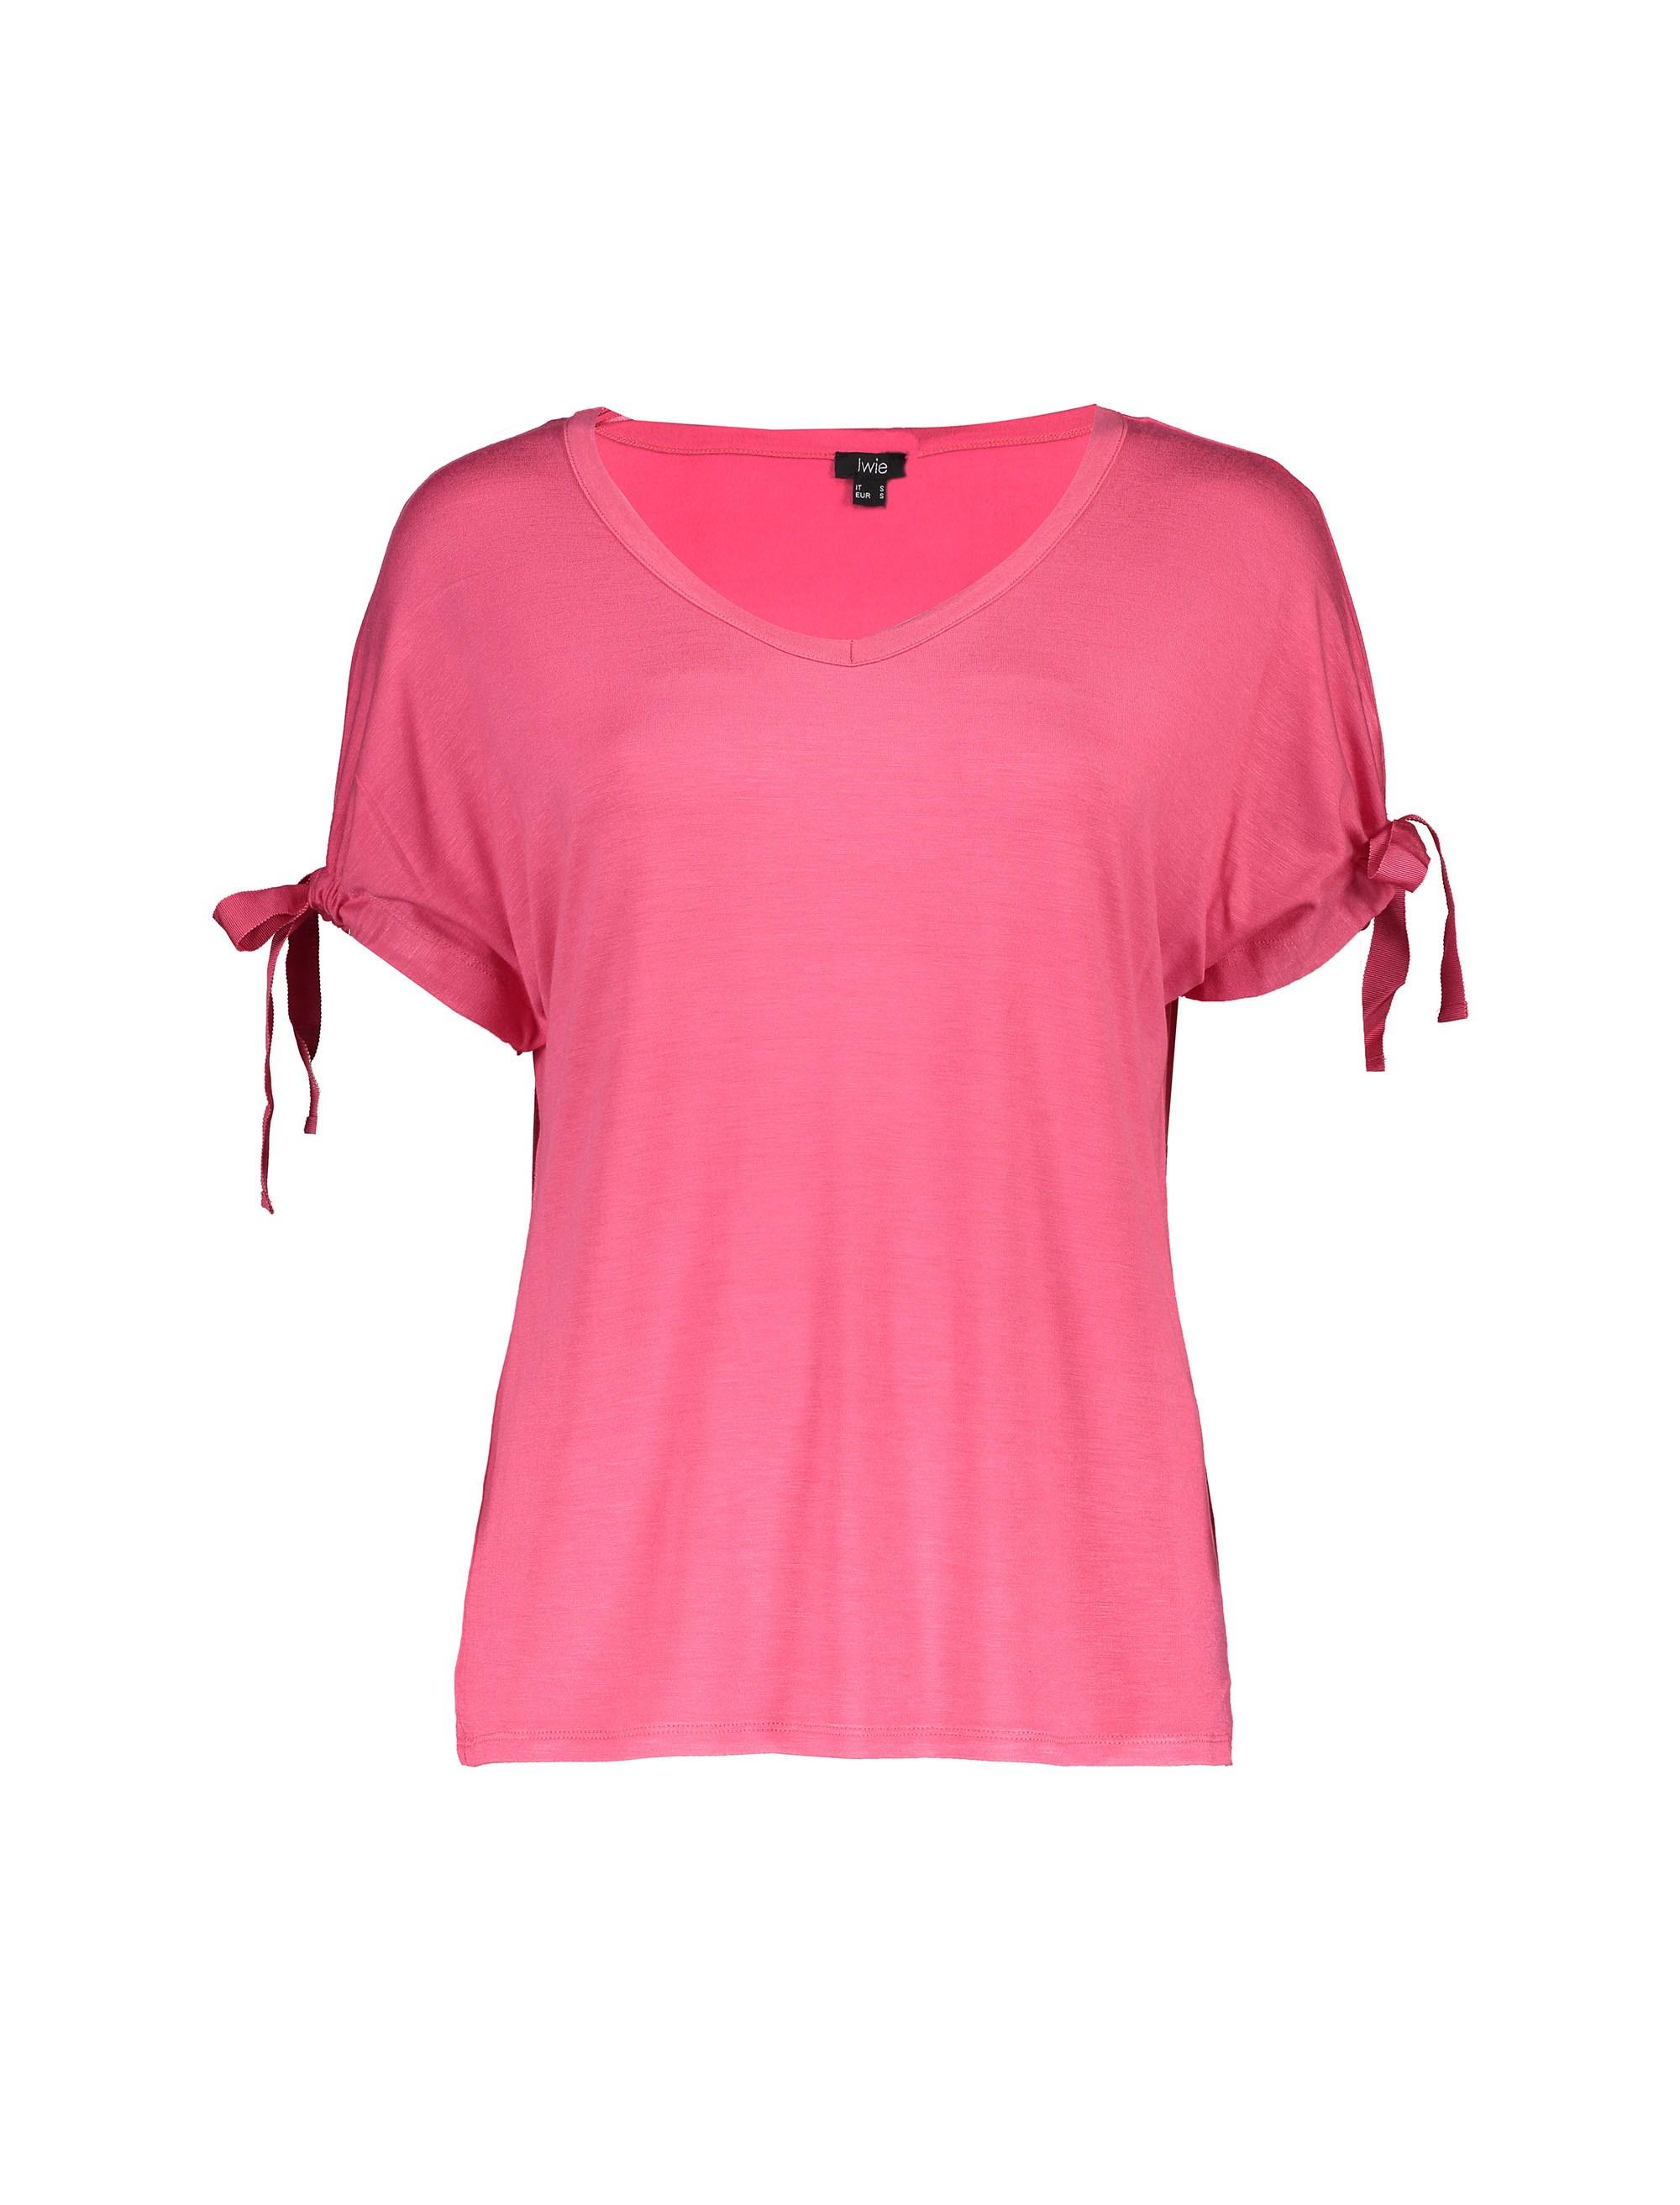 تی شرت ویسکوز یقه هفت زنانه - یوپیم